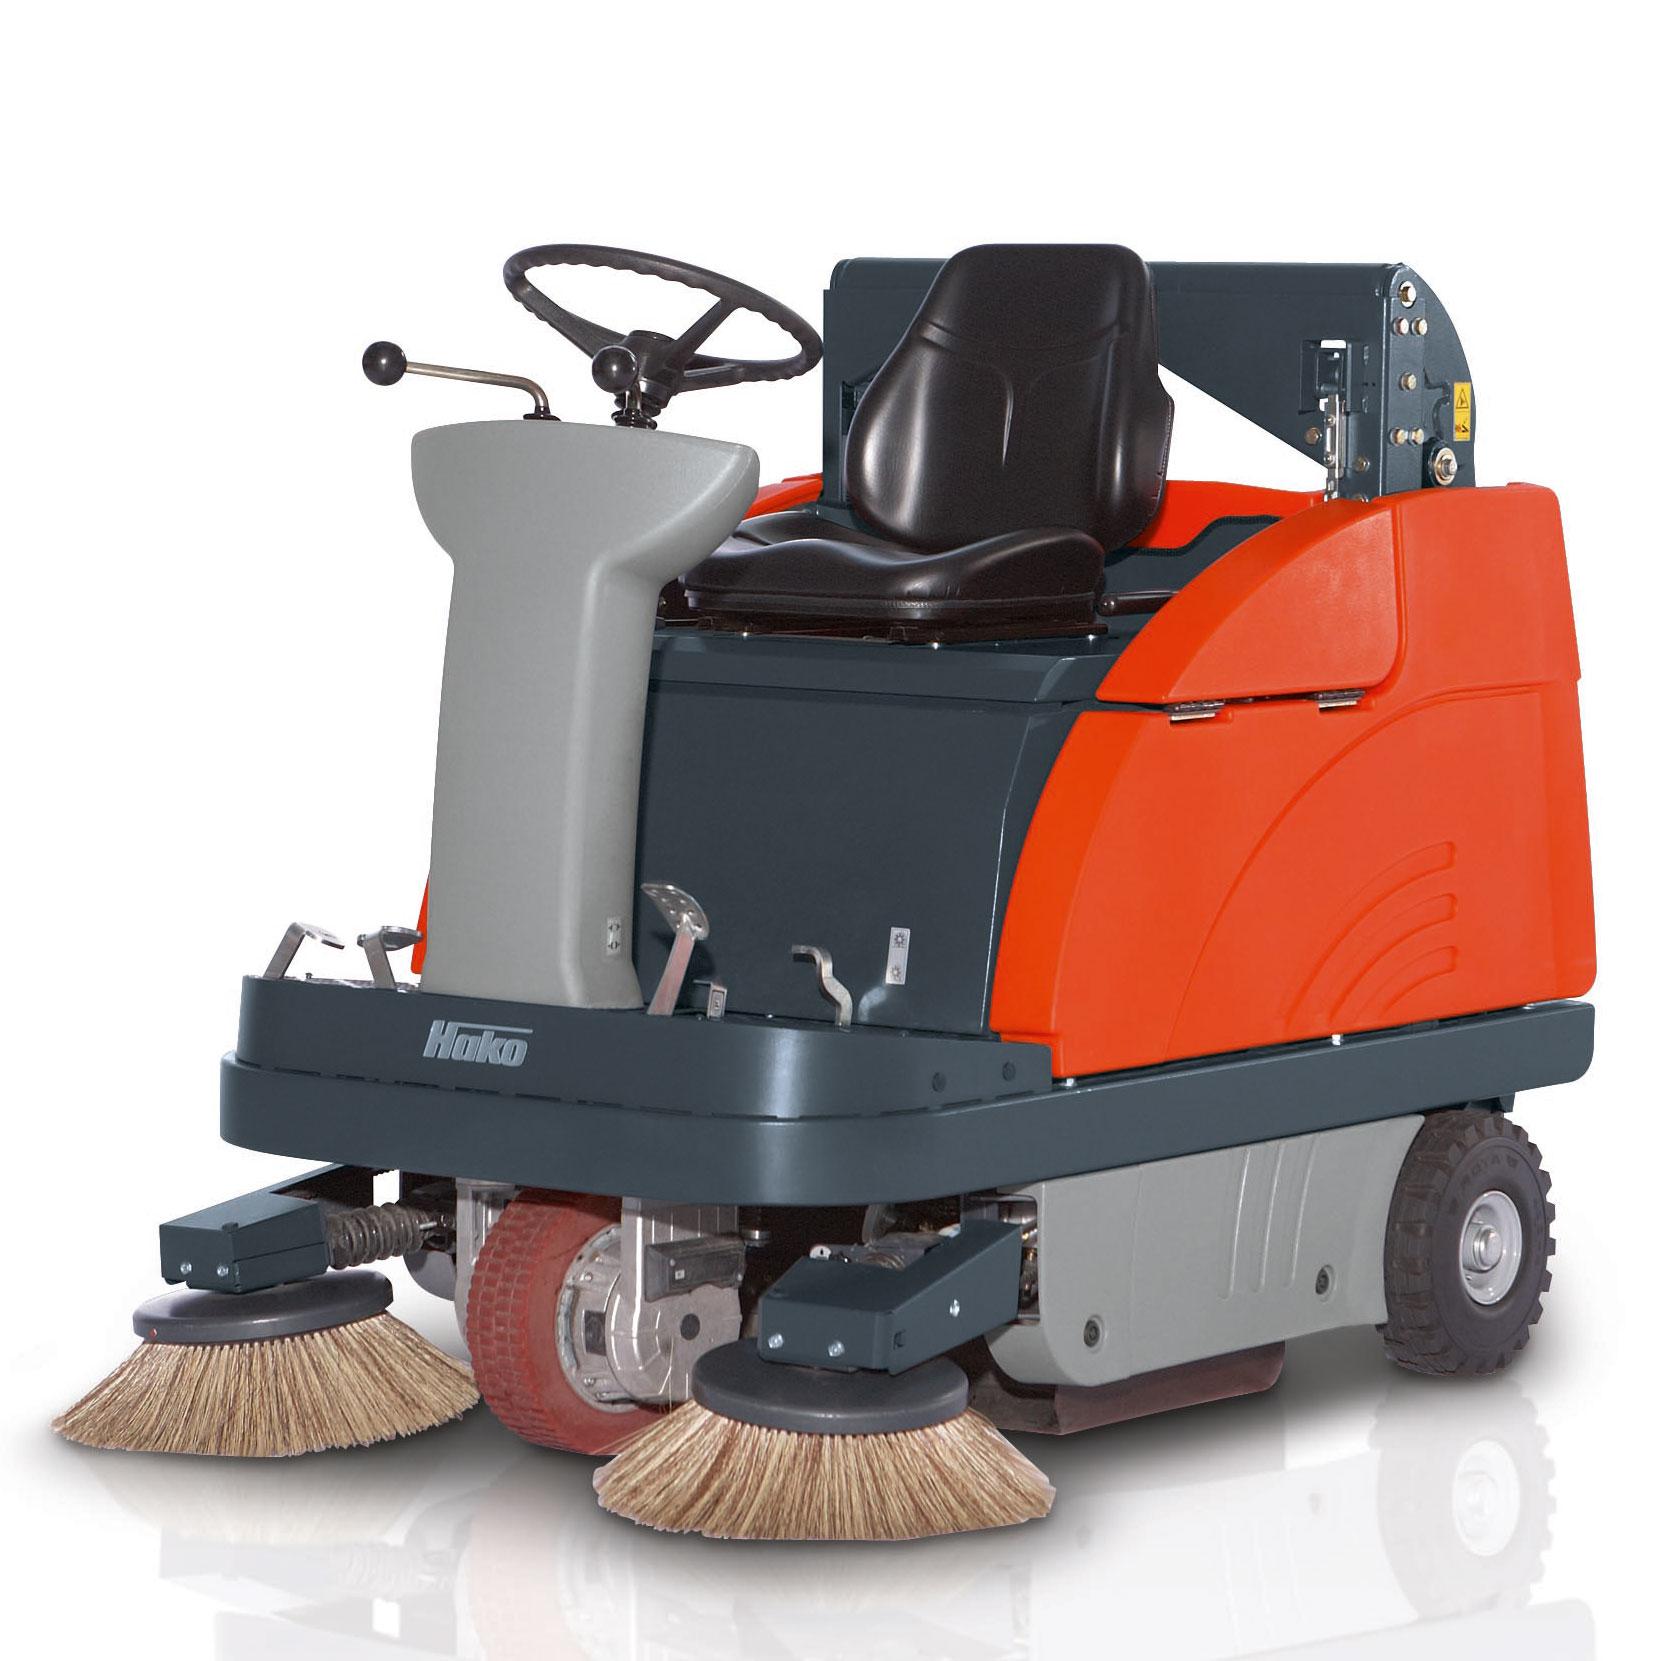 Hako Sweepmaster 980 R/RH